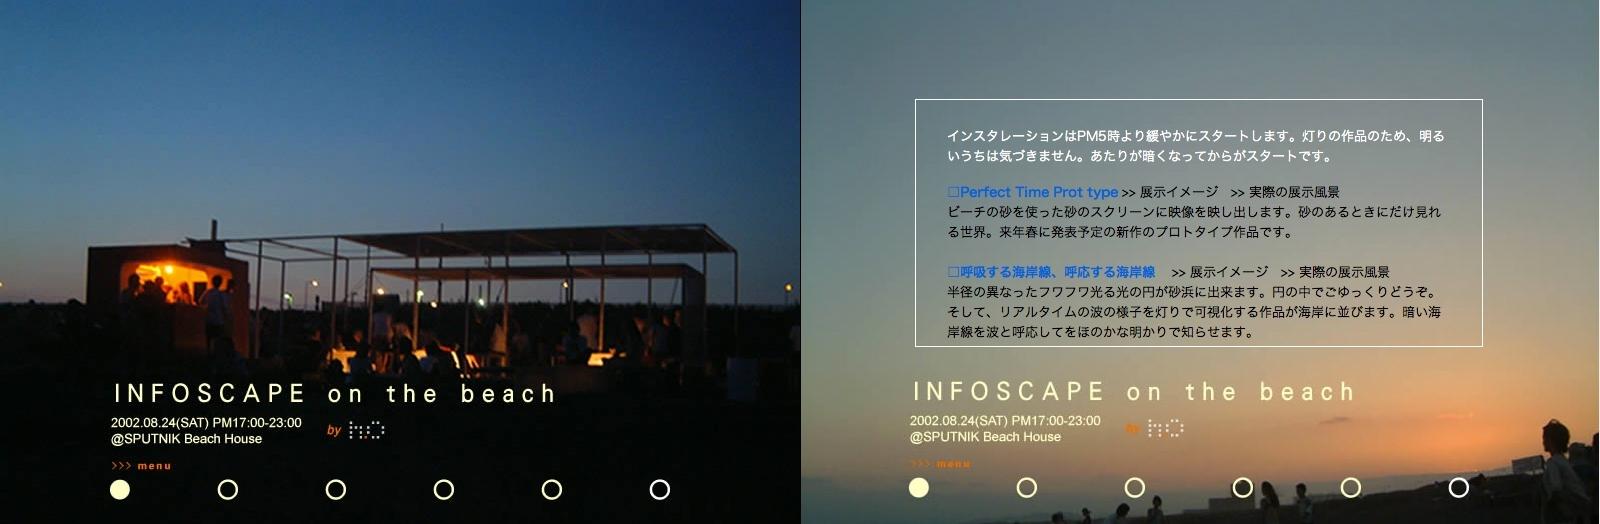 infoscape-2